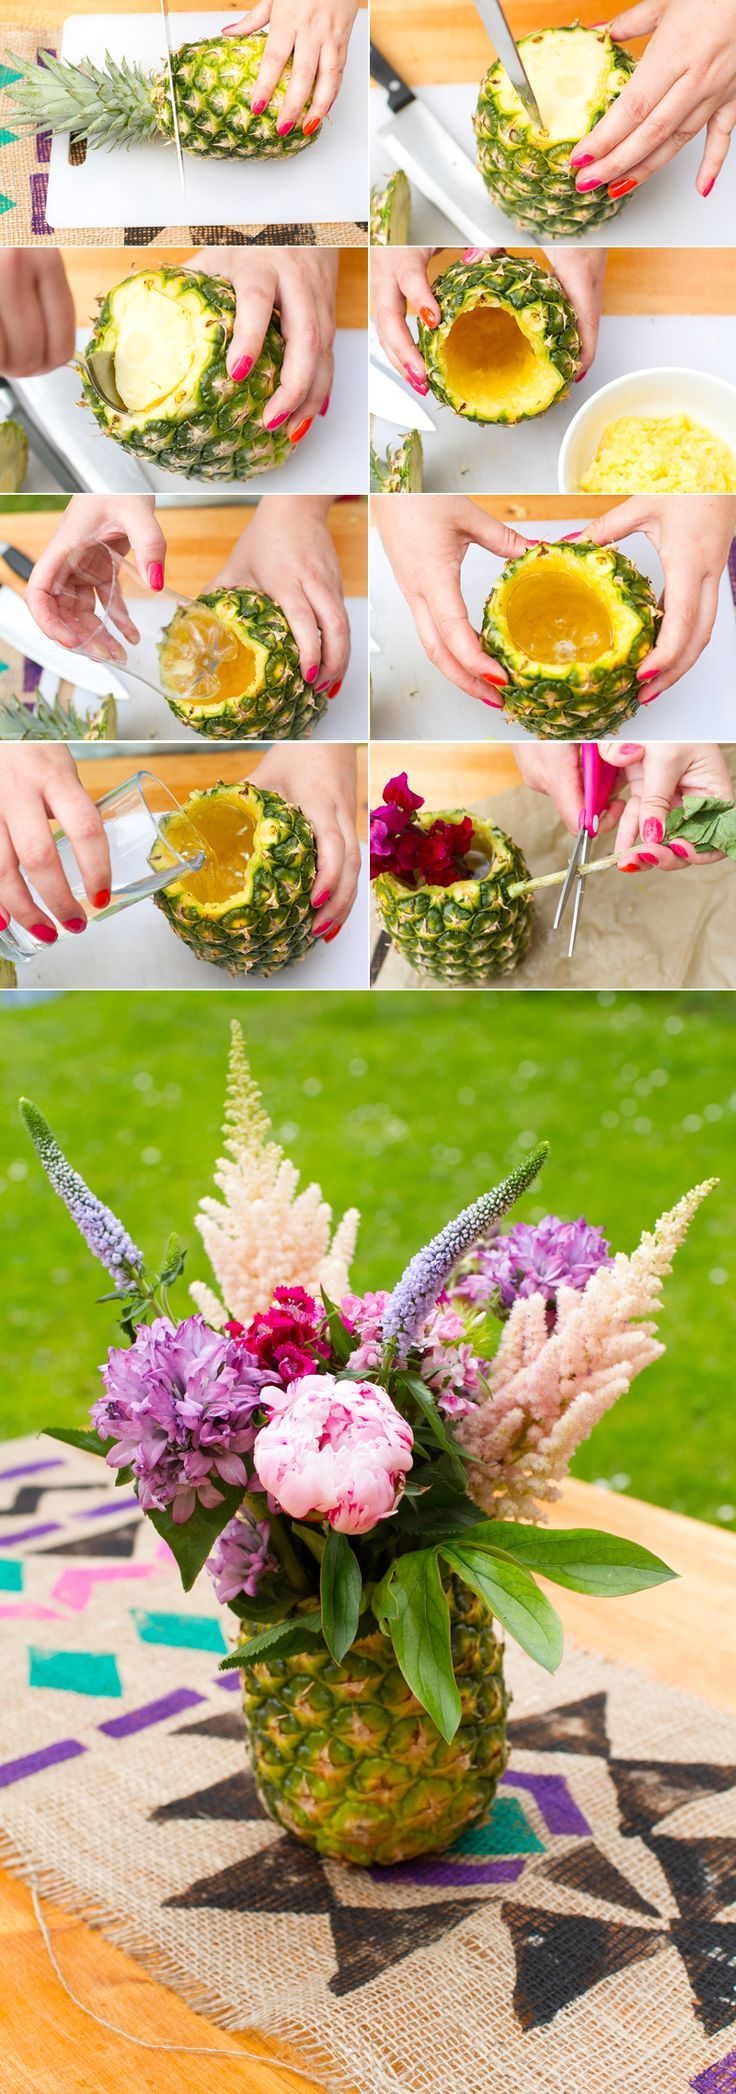 Riciclare l'ananas in un centrotavola